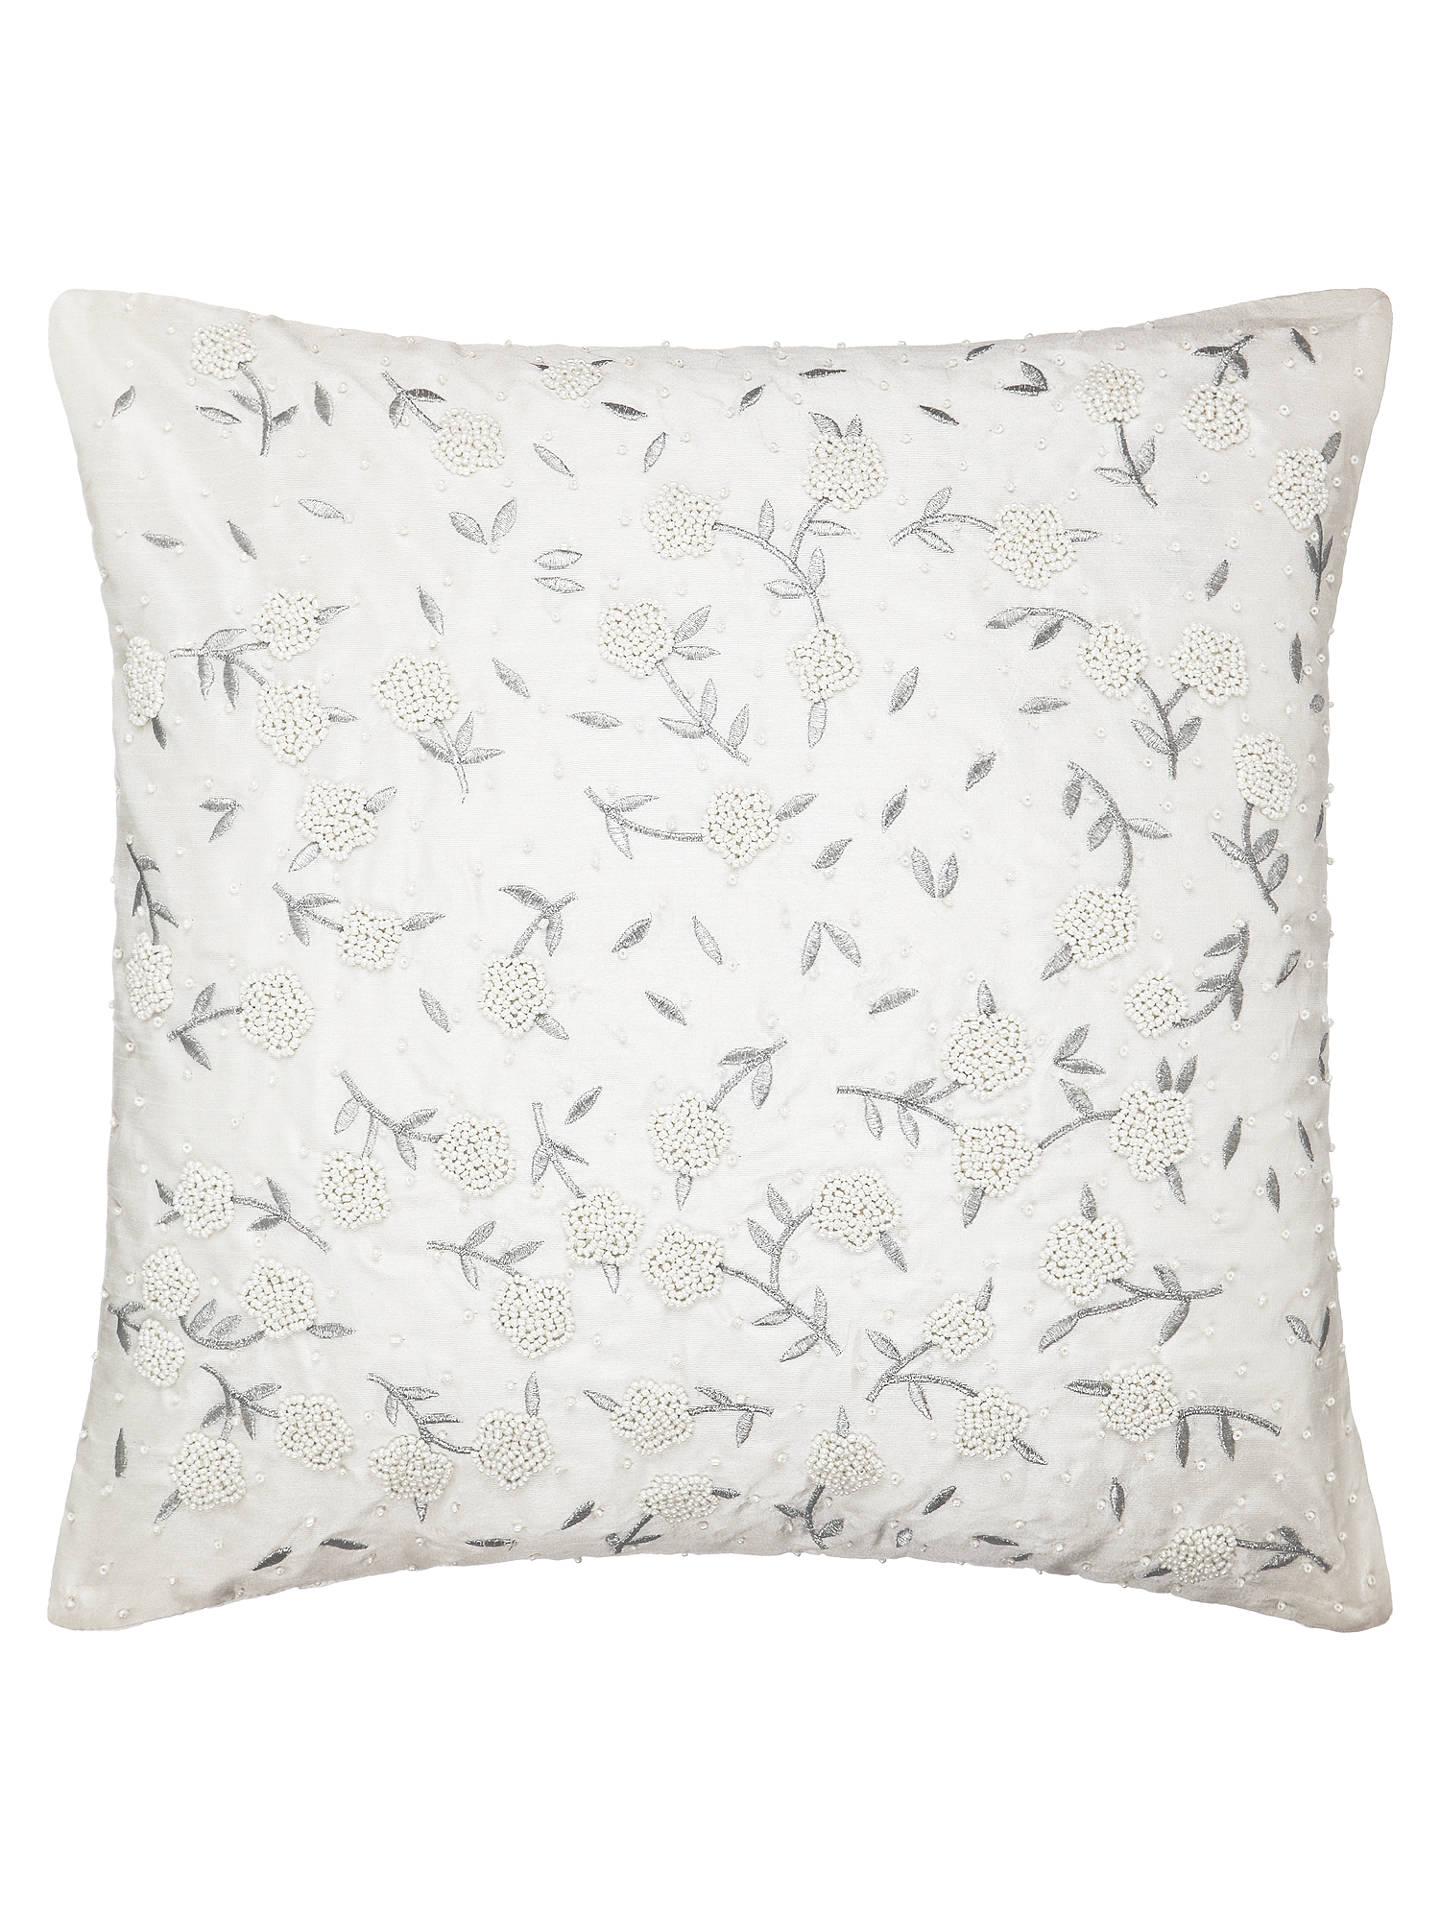 john lewis peony cushion at john lewis partners. Black Bedroom Furniture Sets. Home Design Ideas